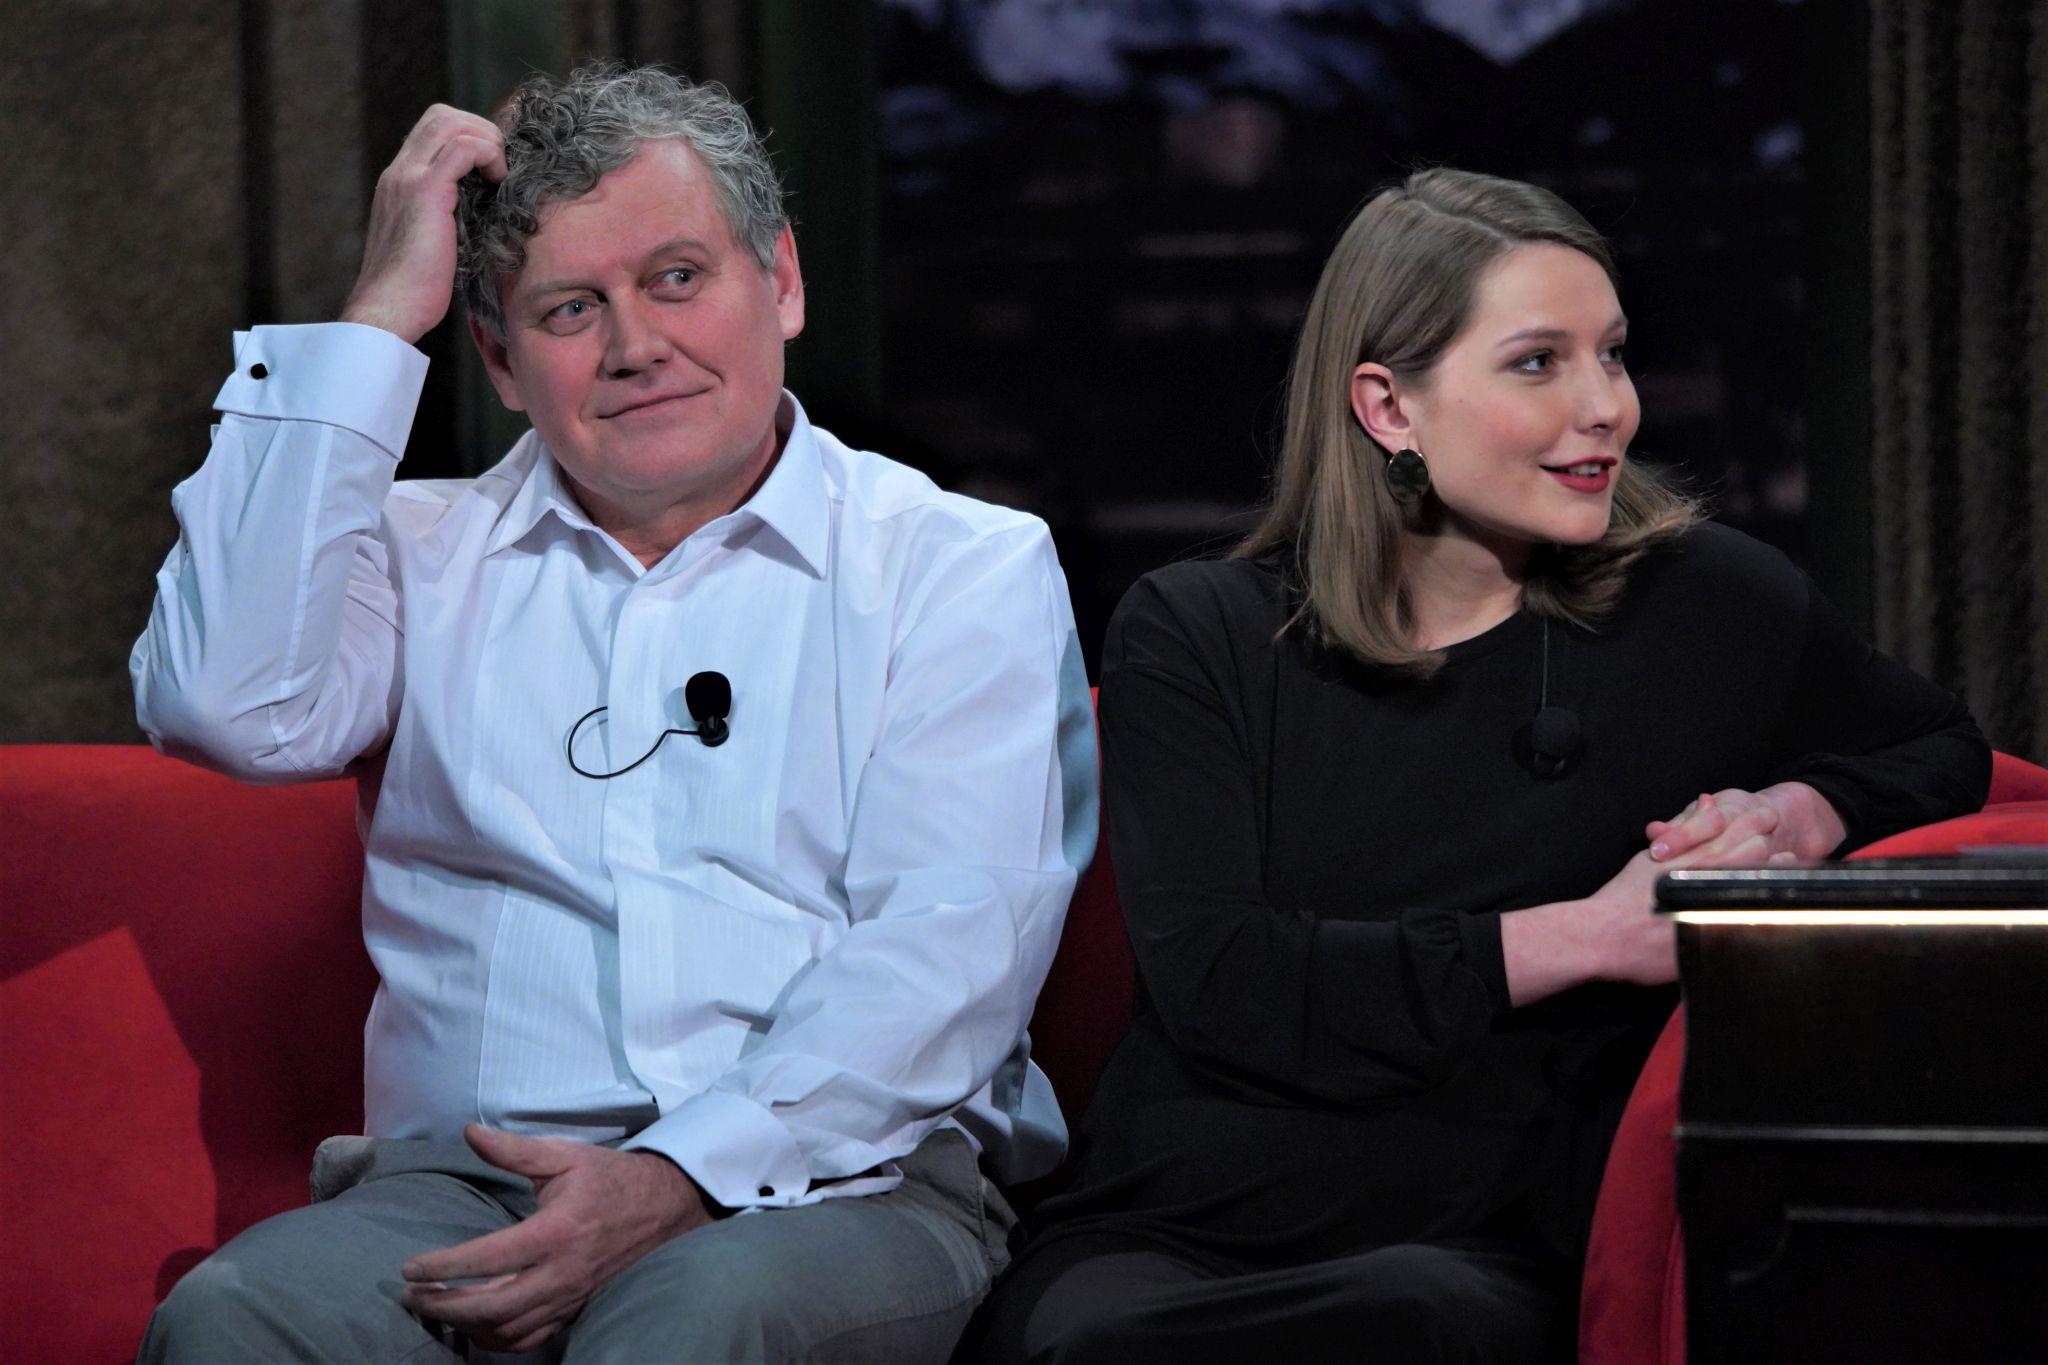 Herci (otec a dcera) Miroslav a Eliška Hanušovi v SJK 24. 2. 2021